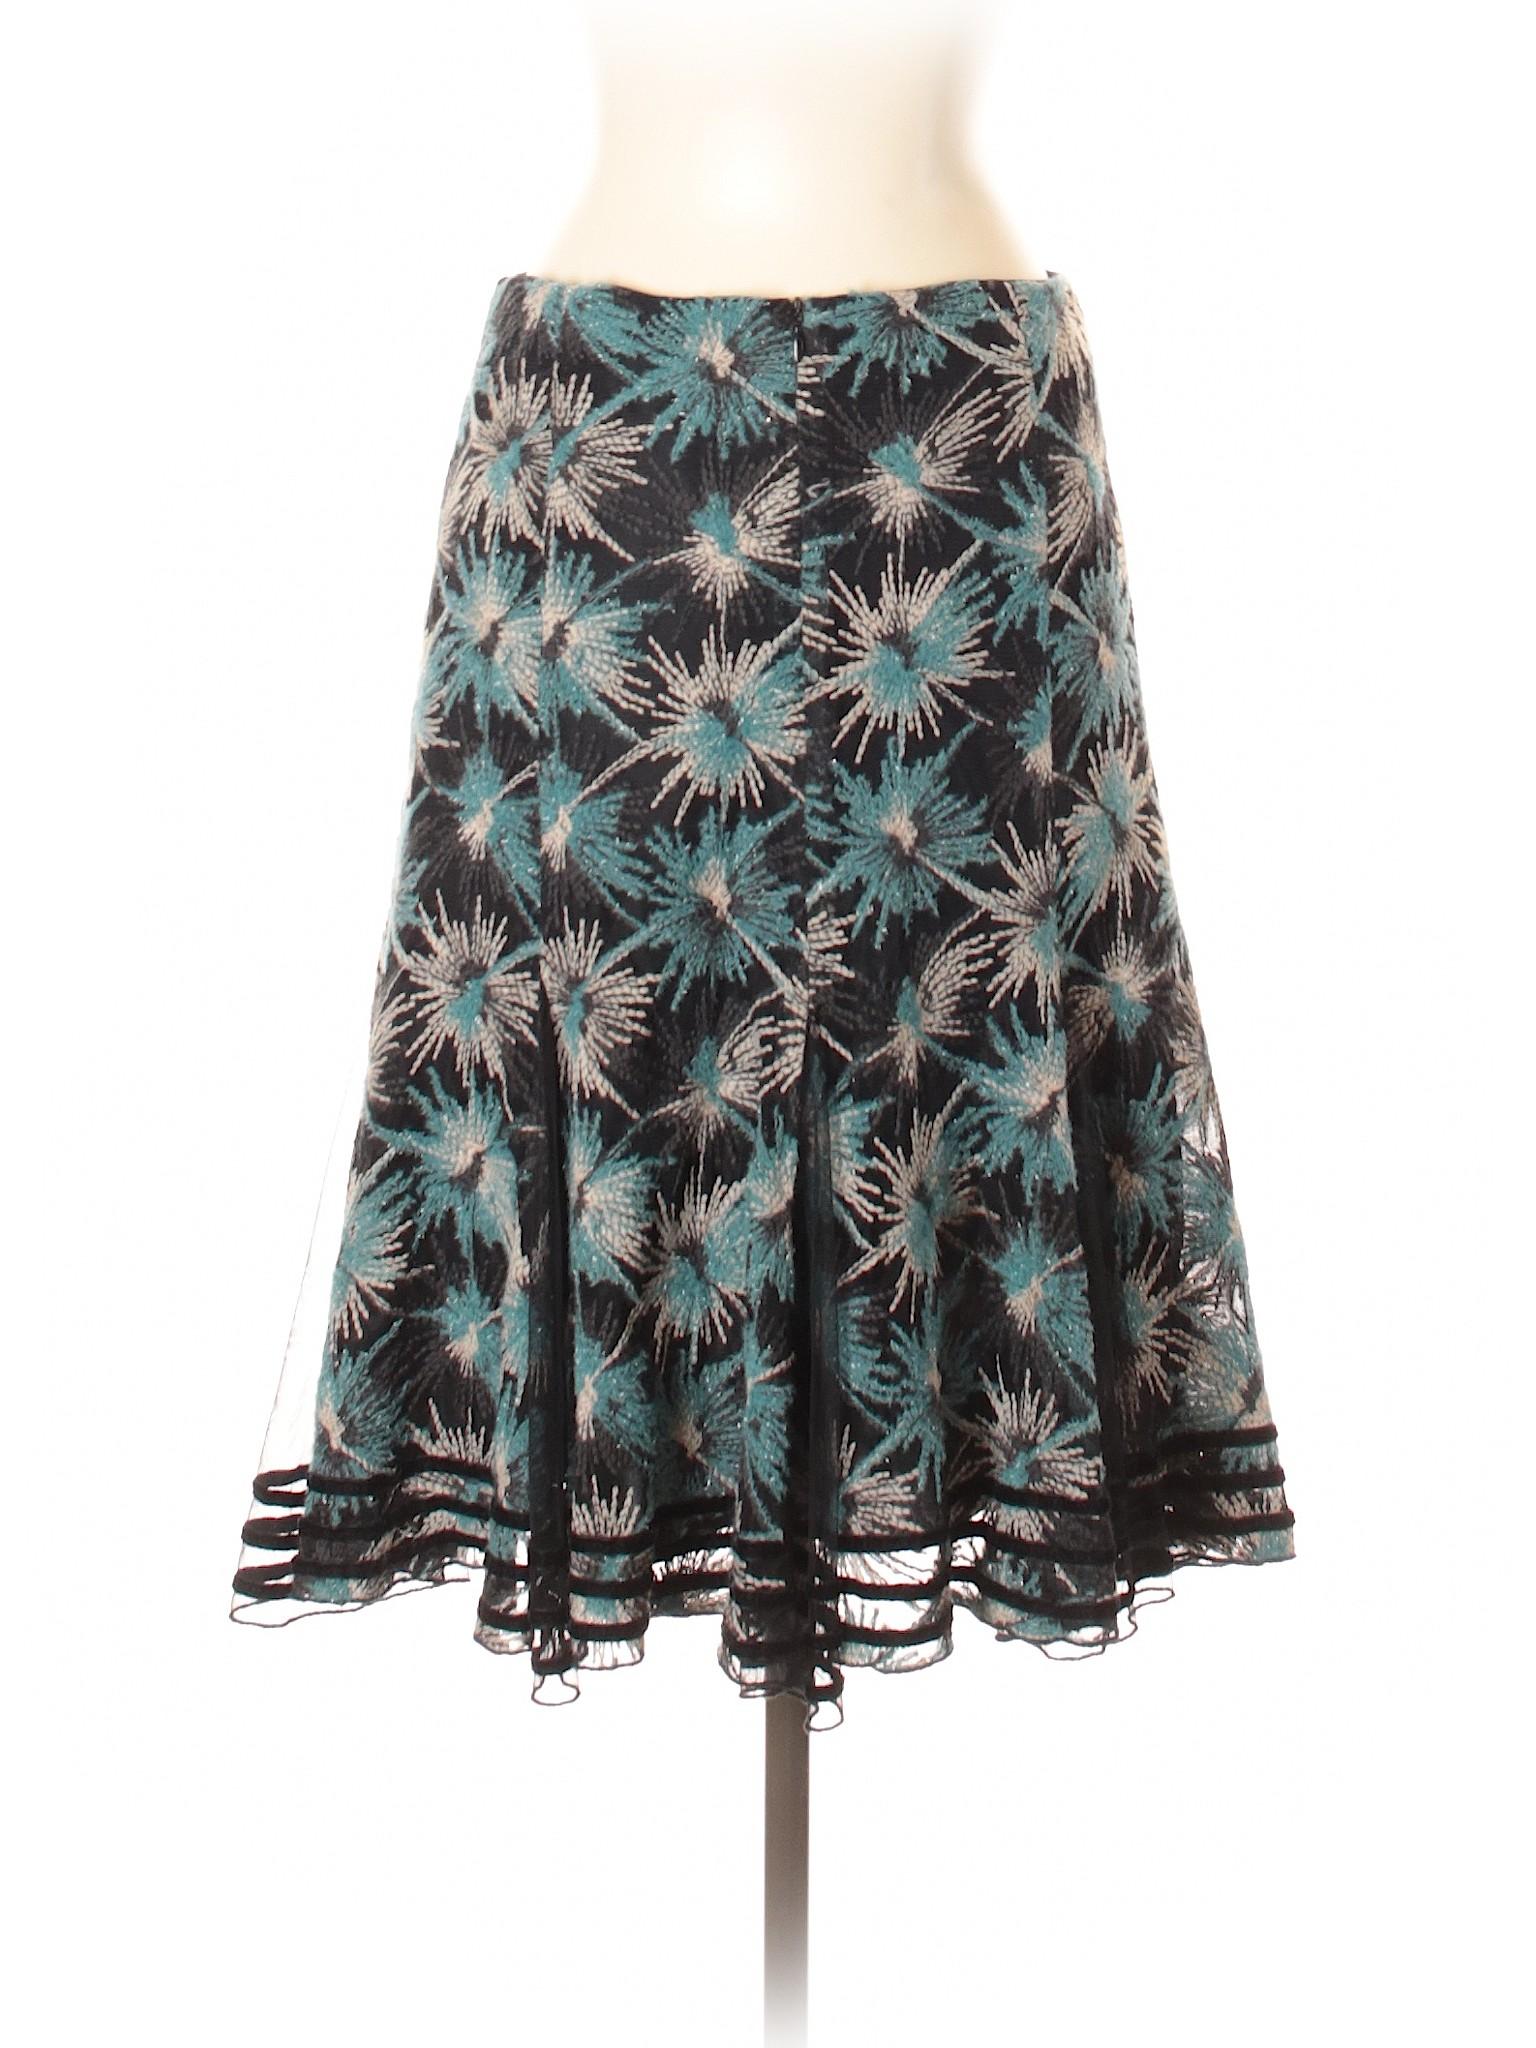 Skirt Casual Boutique Casual Skirt Casual Casual Skirt Boutique Boutique Skirt Boutique Casual Boutique Skirt 4xf46HBq